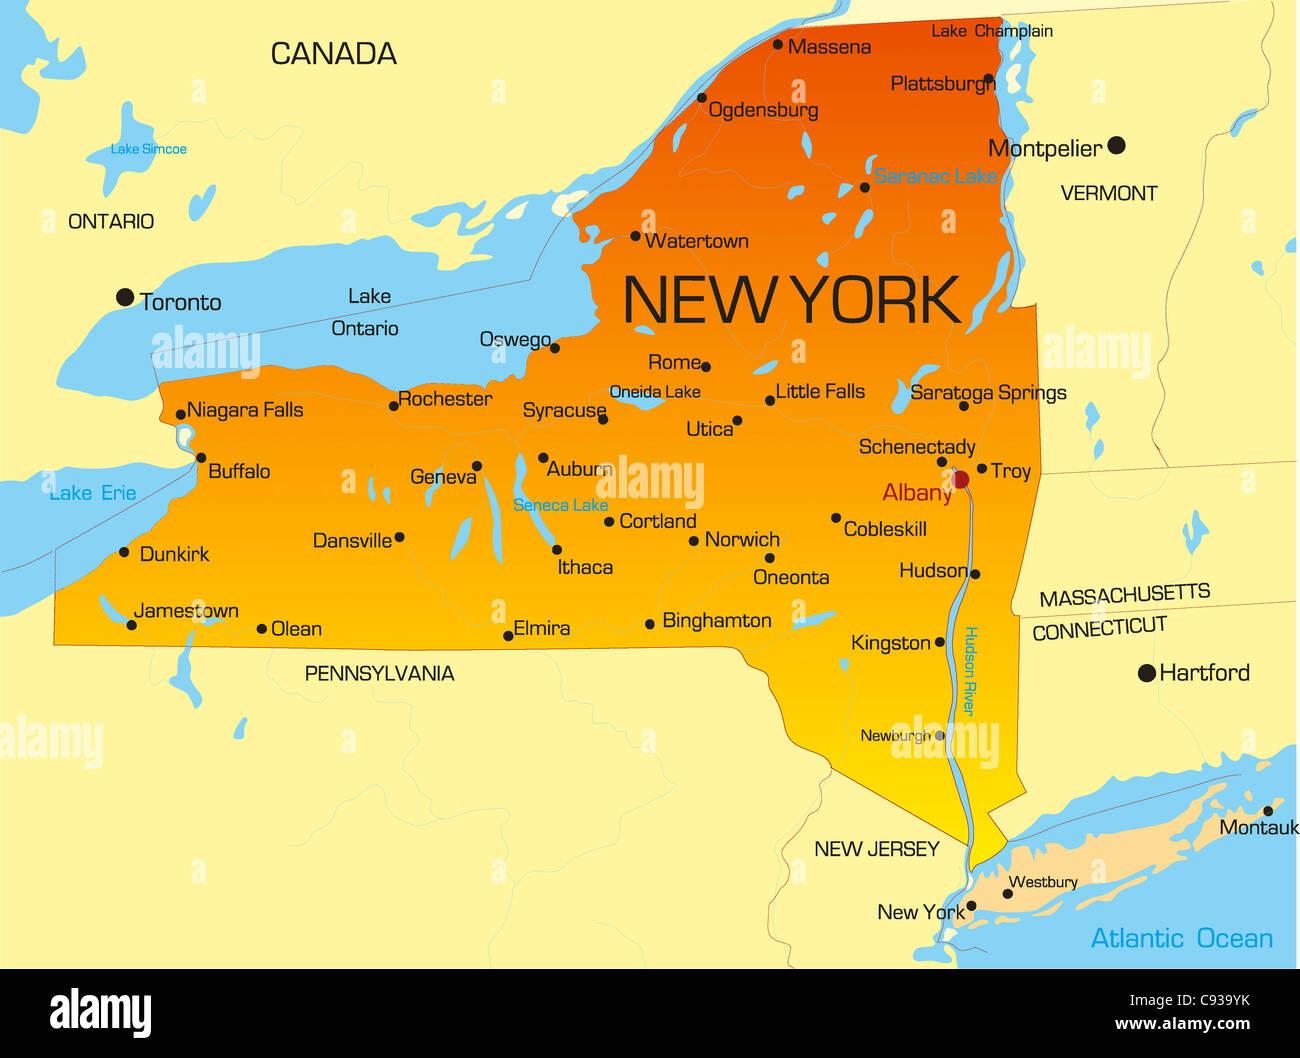 Cartina America New York.Vector Color Map Of New York State Usa Stock Photo Alamy